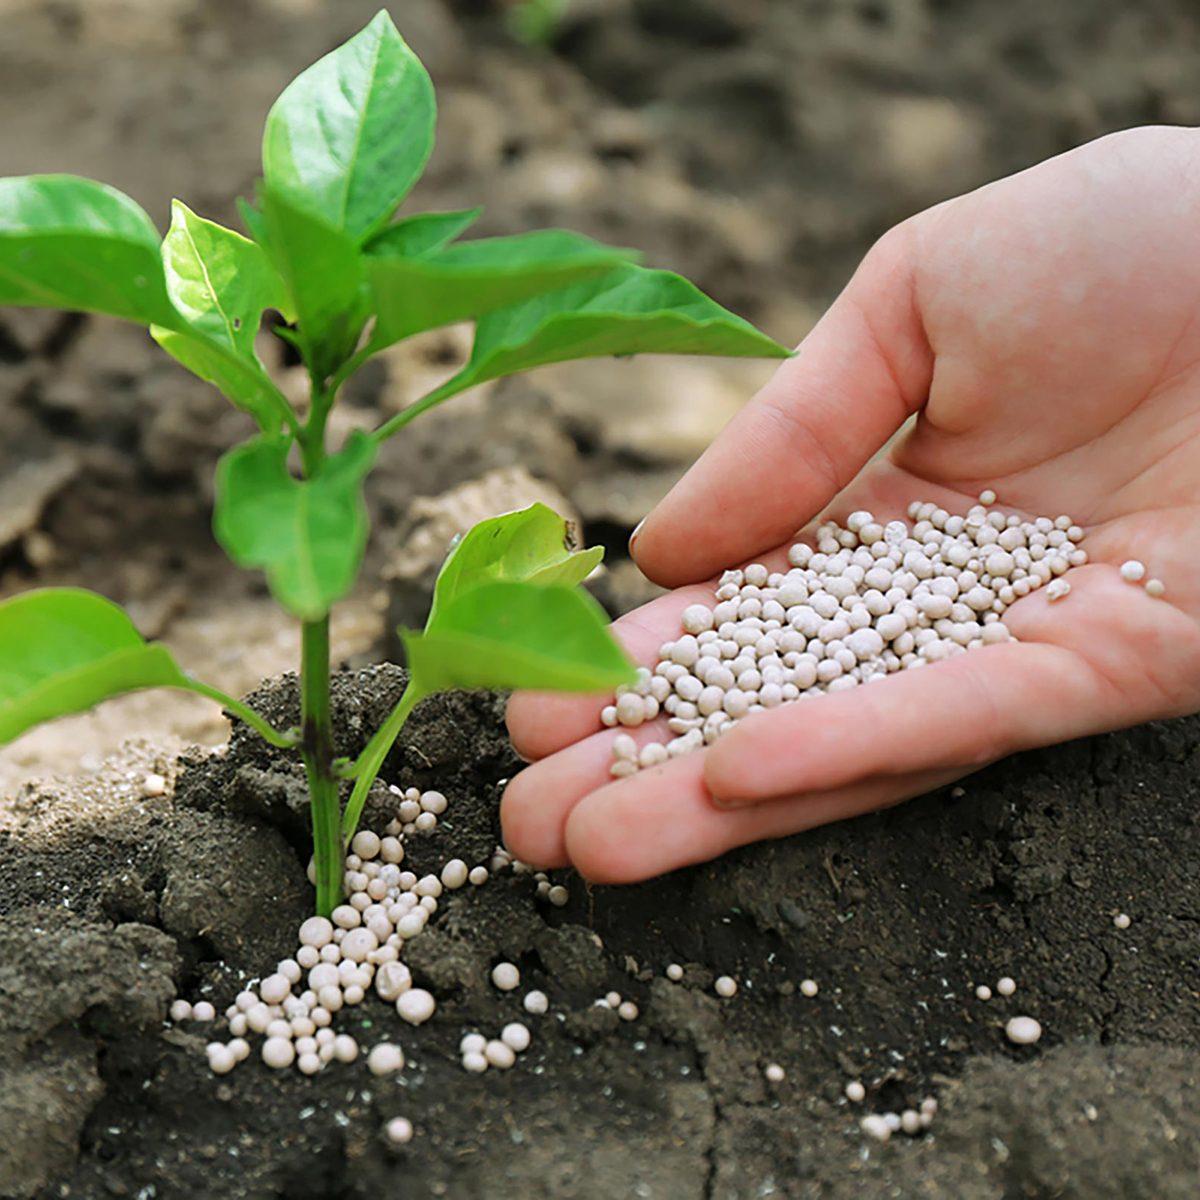 Laying fertilizer around a plant